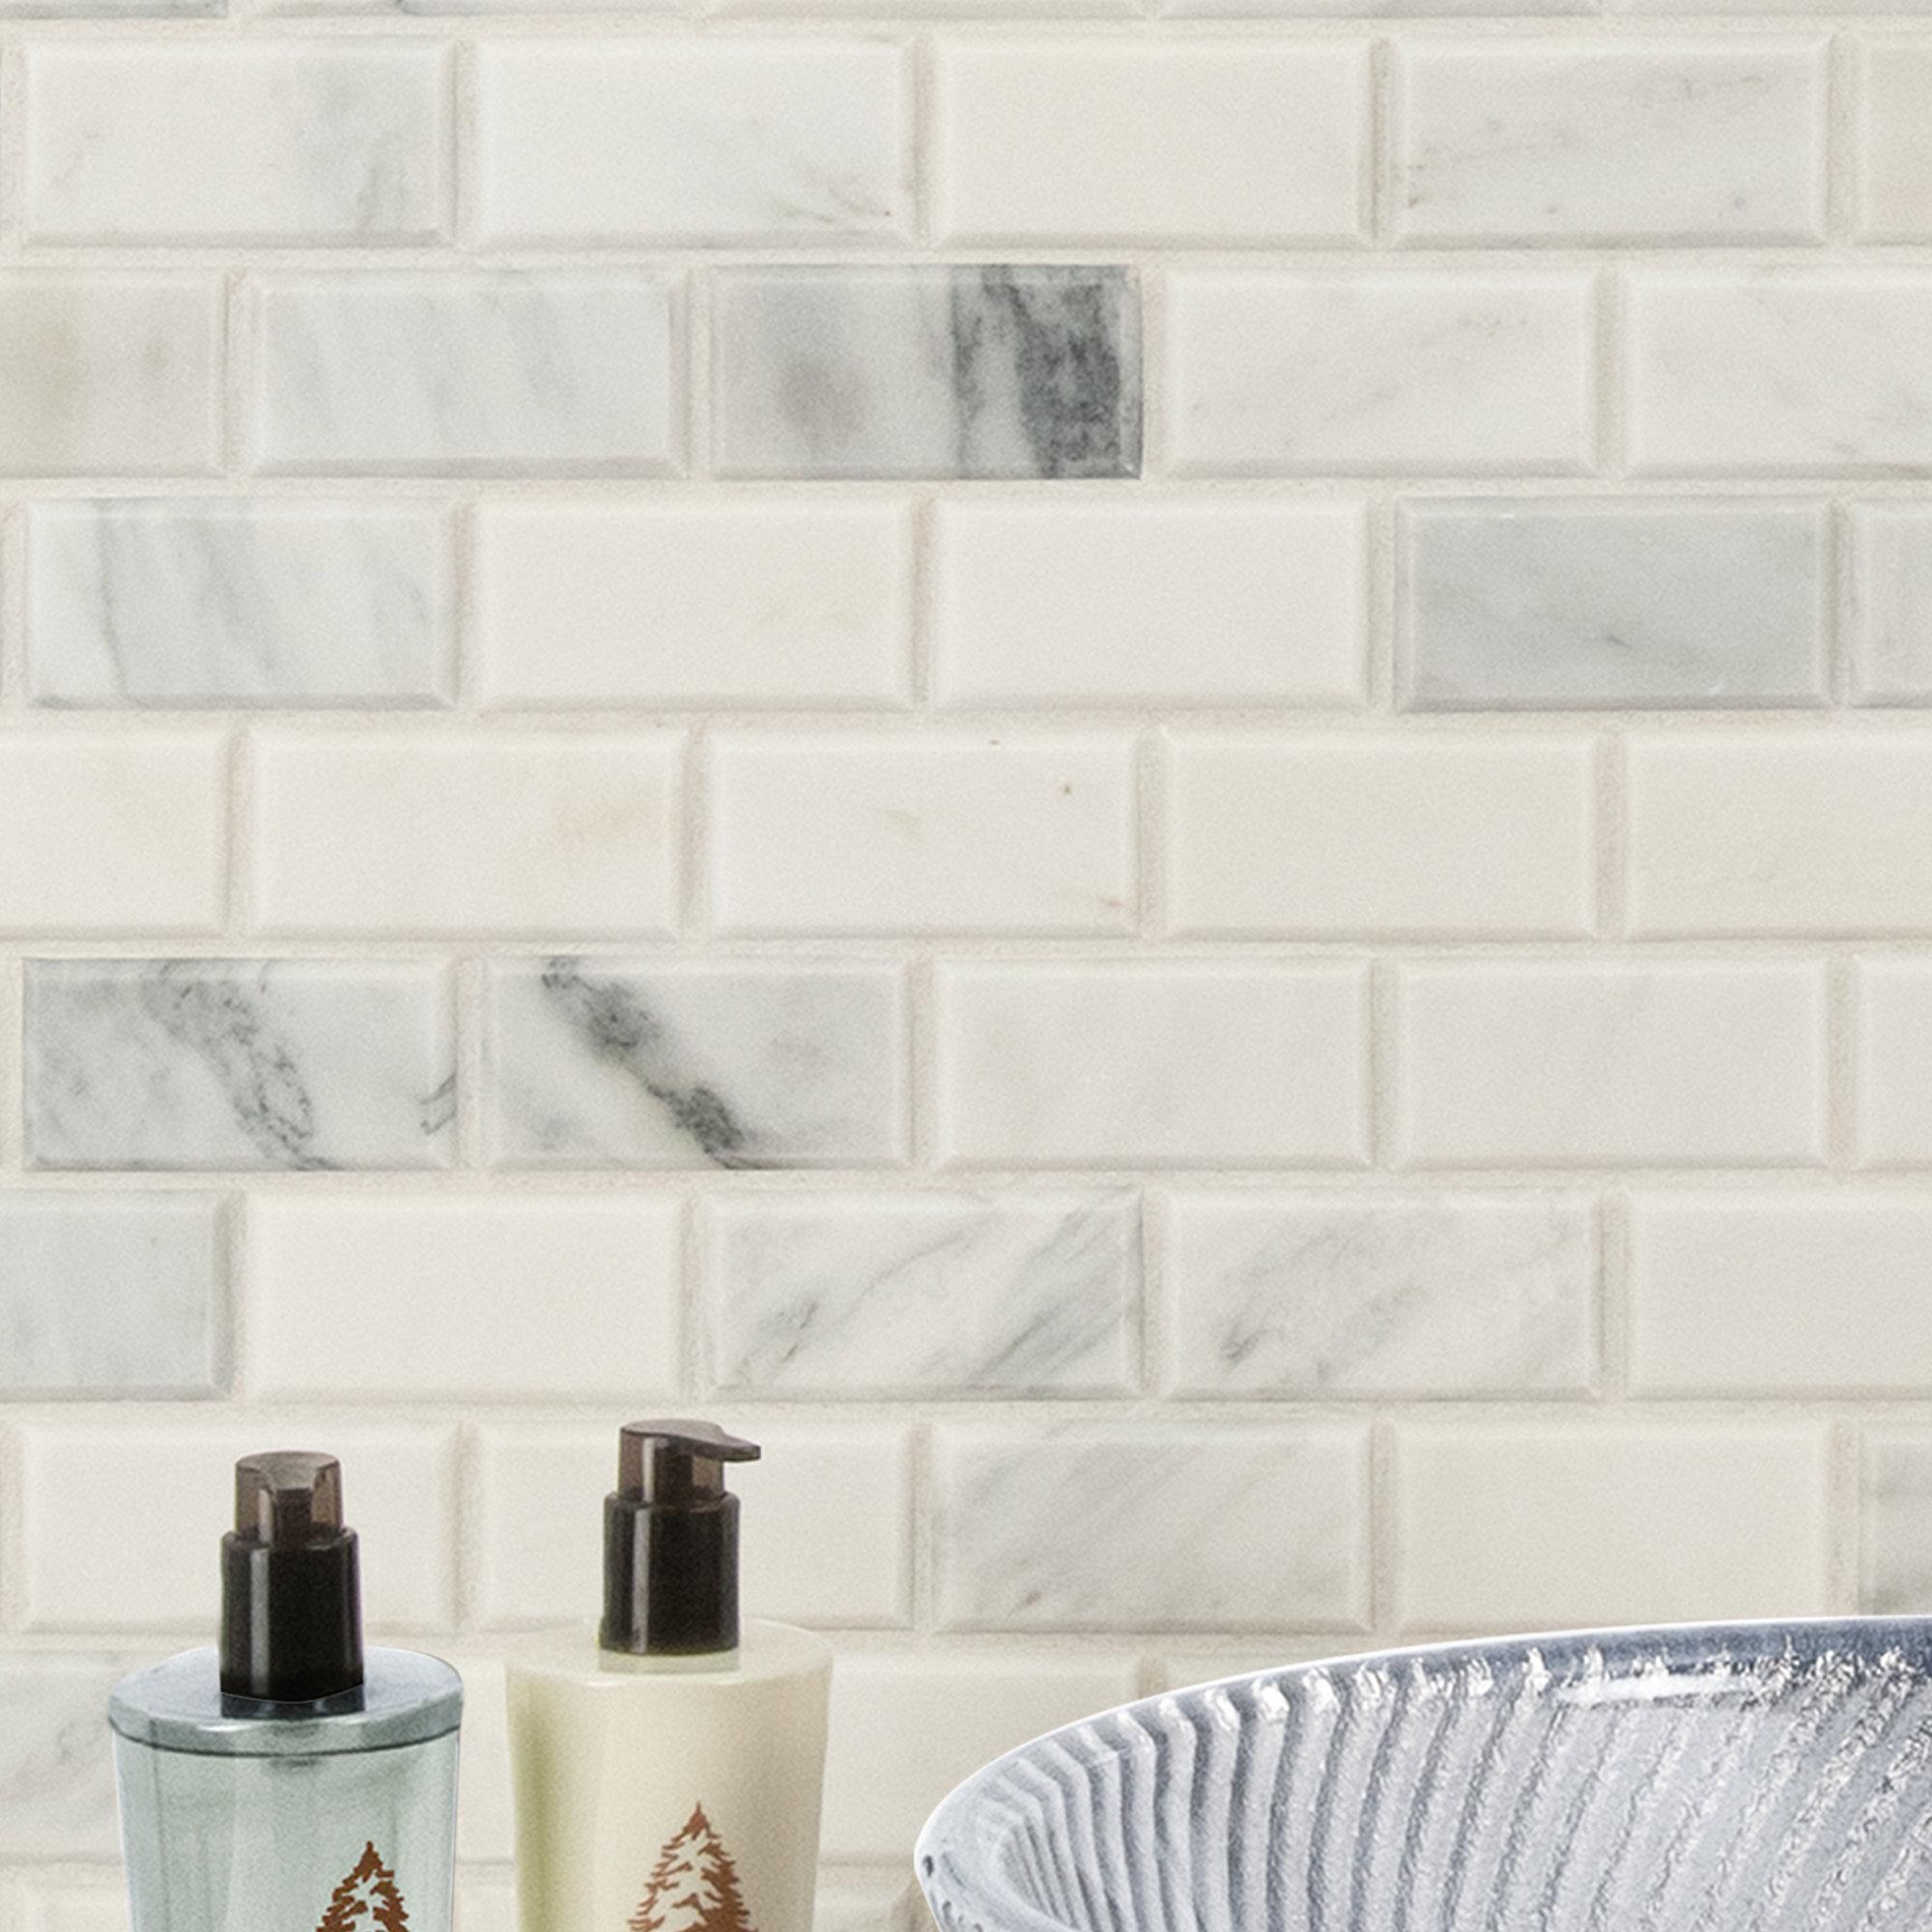 Arabescato Carrara 2 X 4 Beveled Marble Brick Joint Mosaic Wall And Floor Tile Reviews